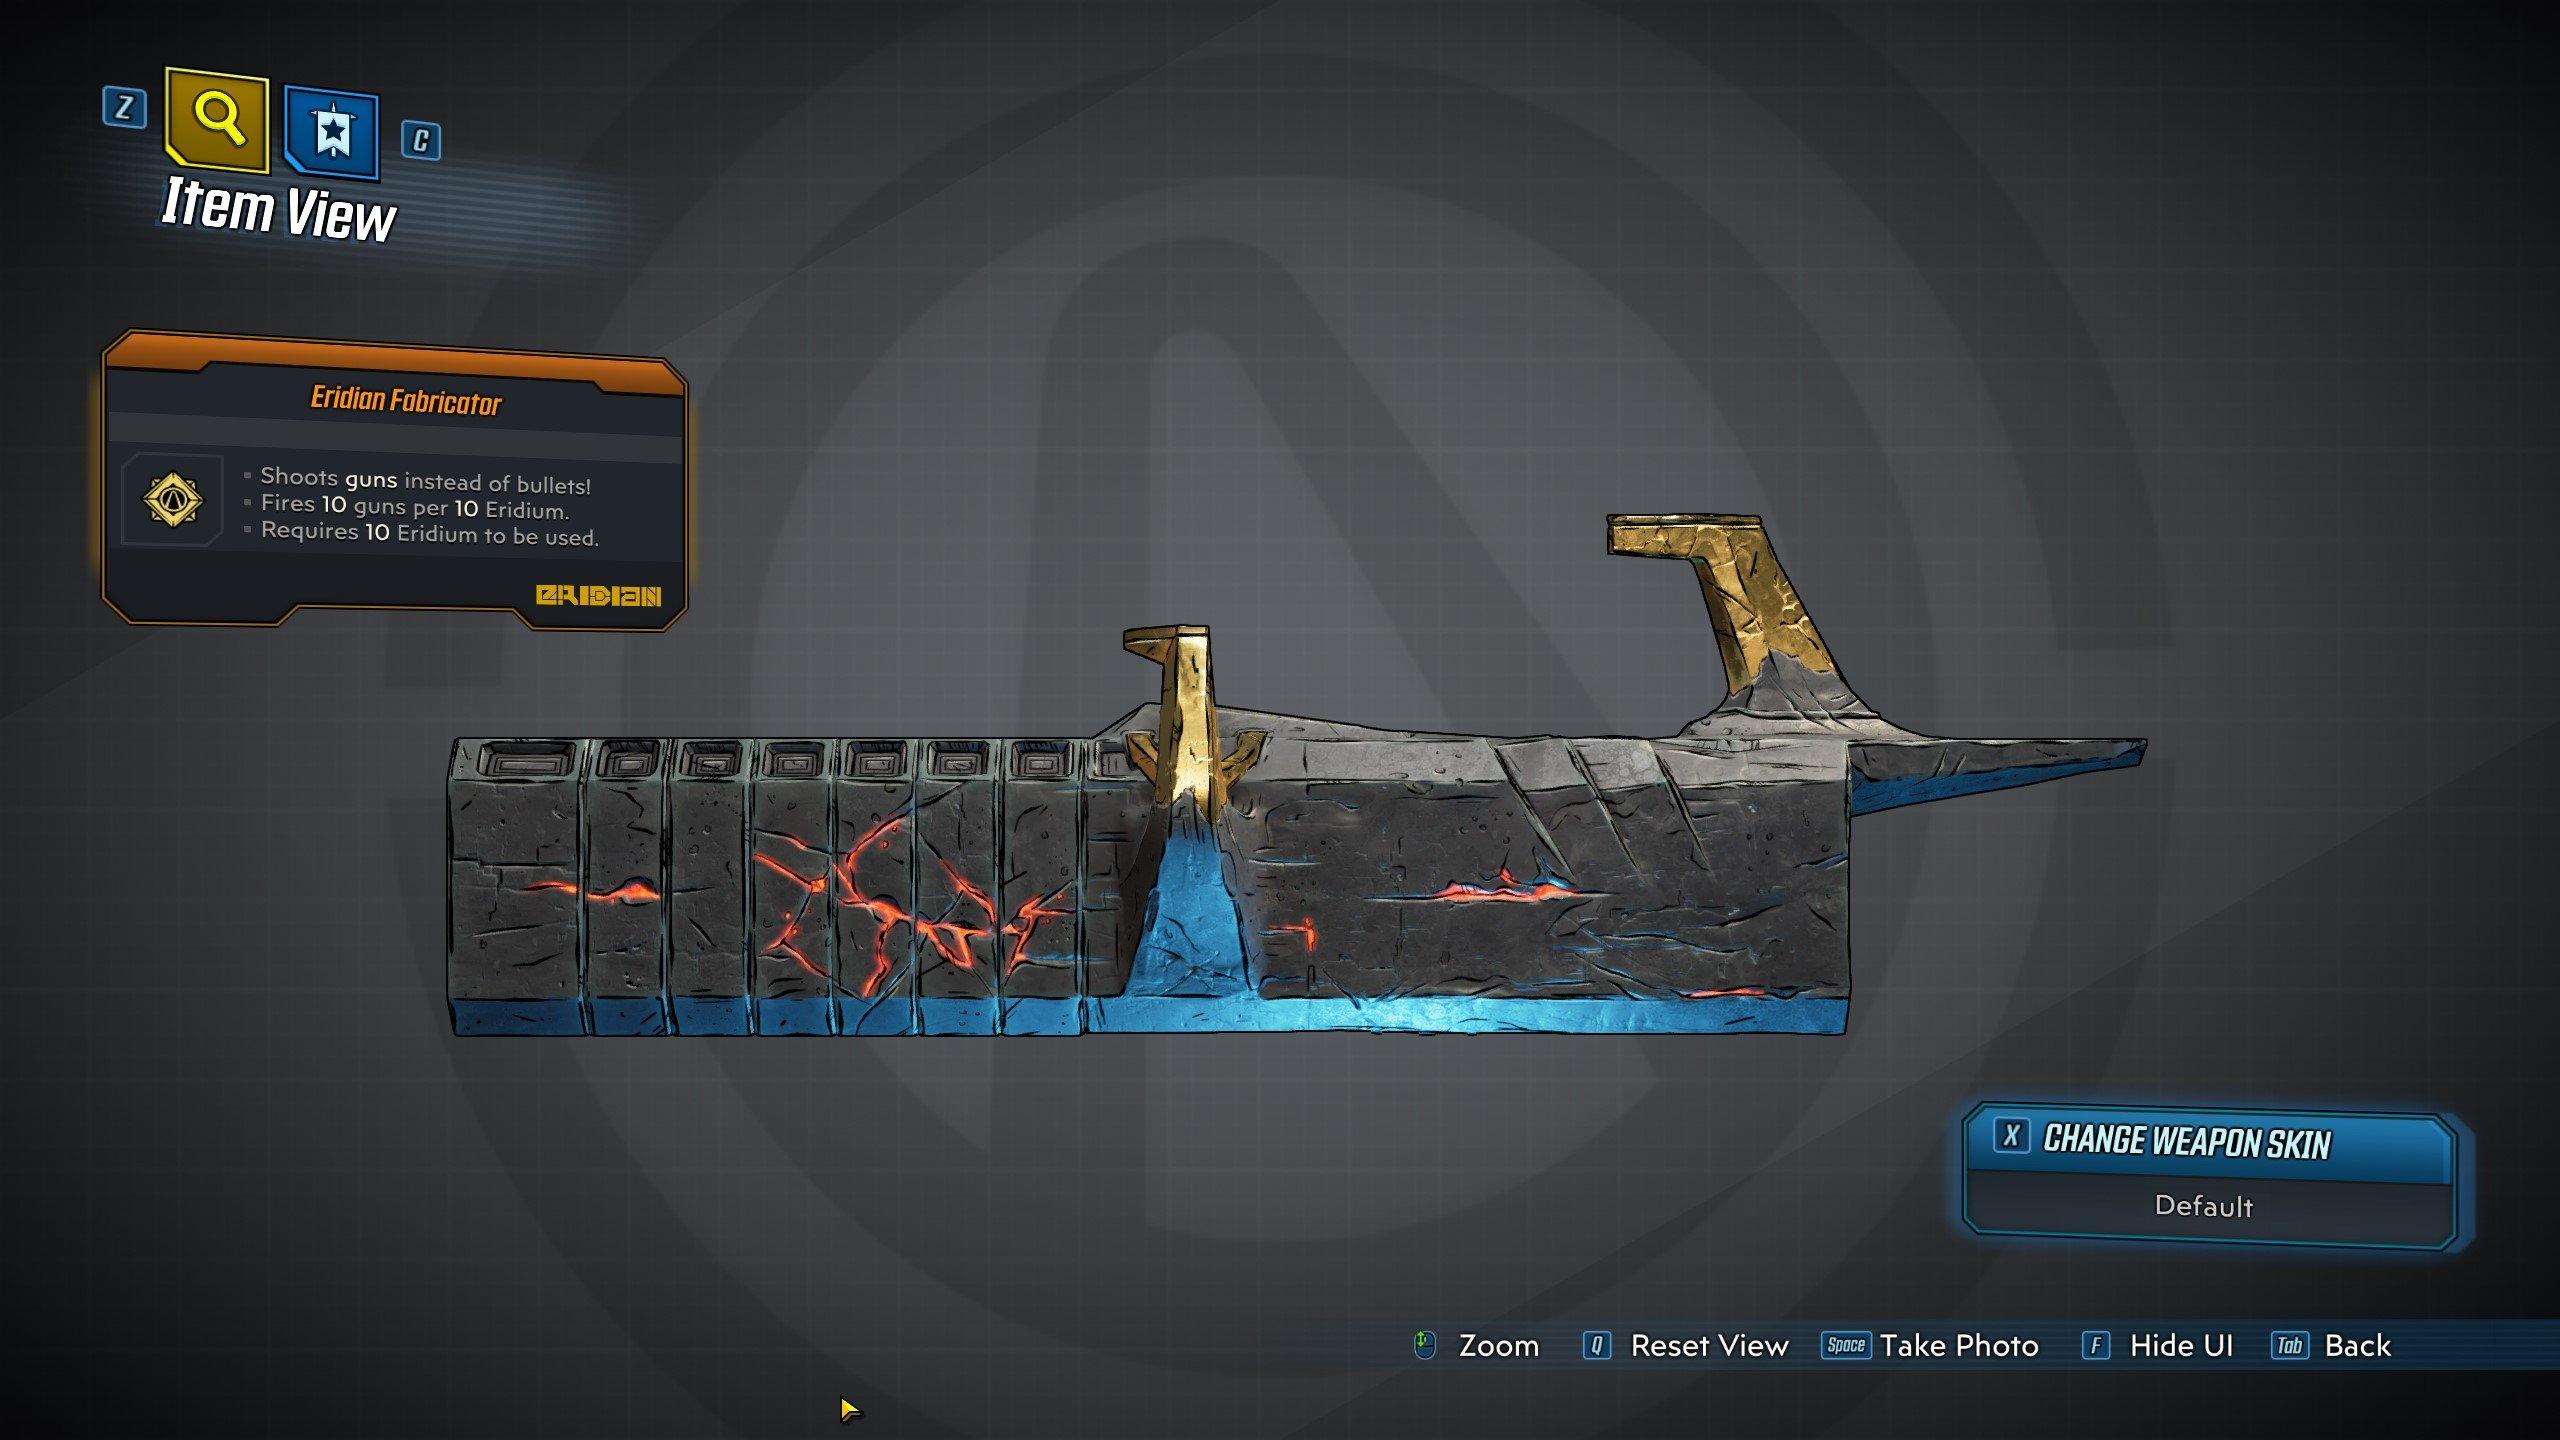 Borderlands 3 - Eridian Fabricator